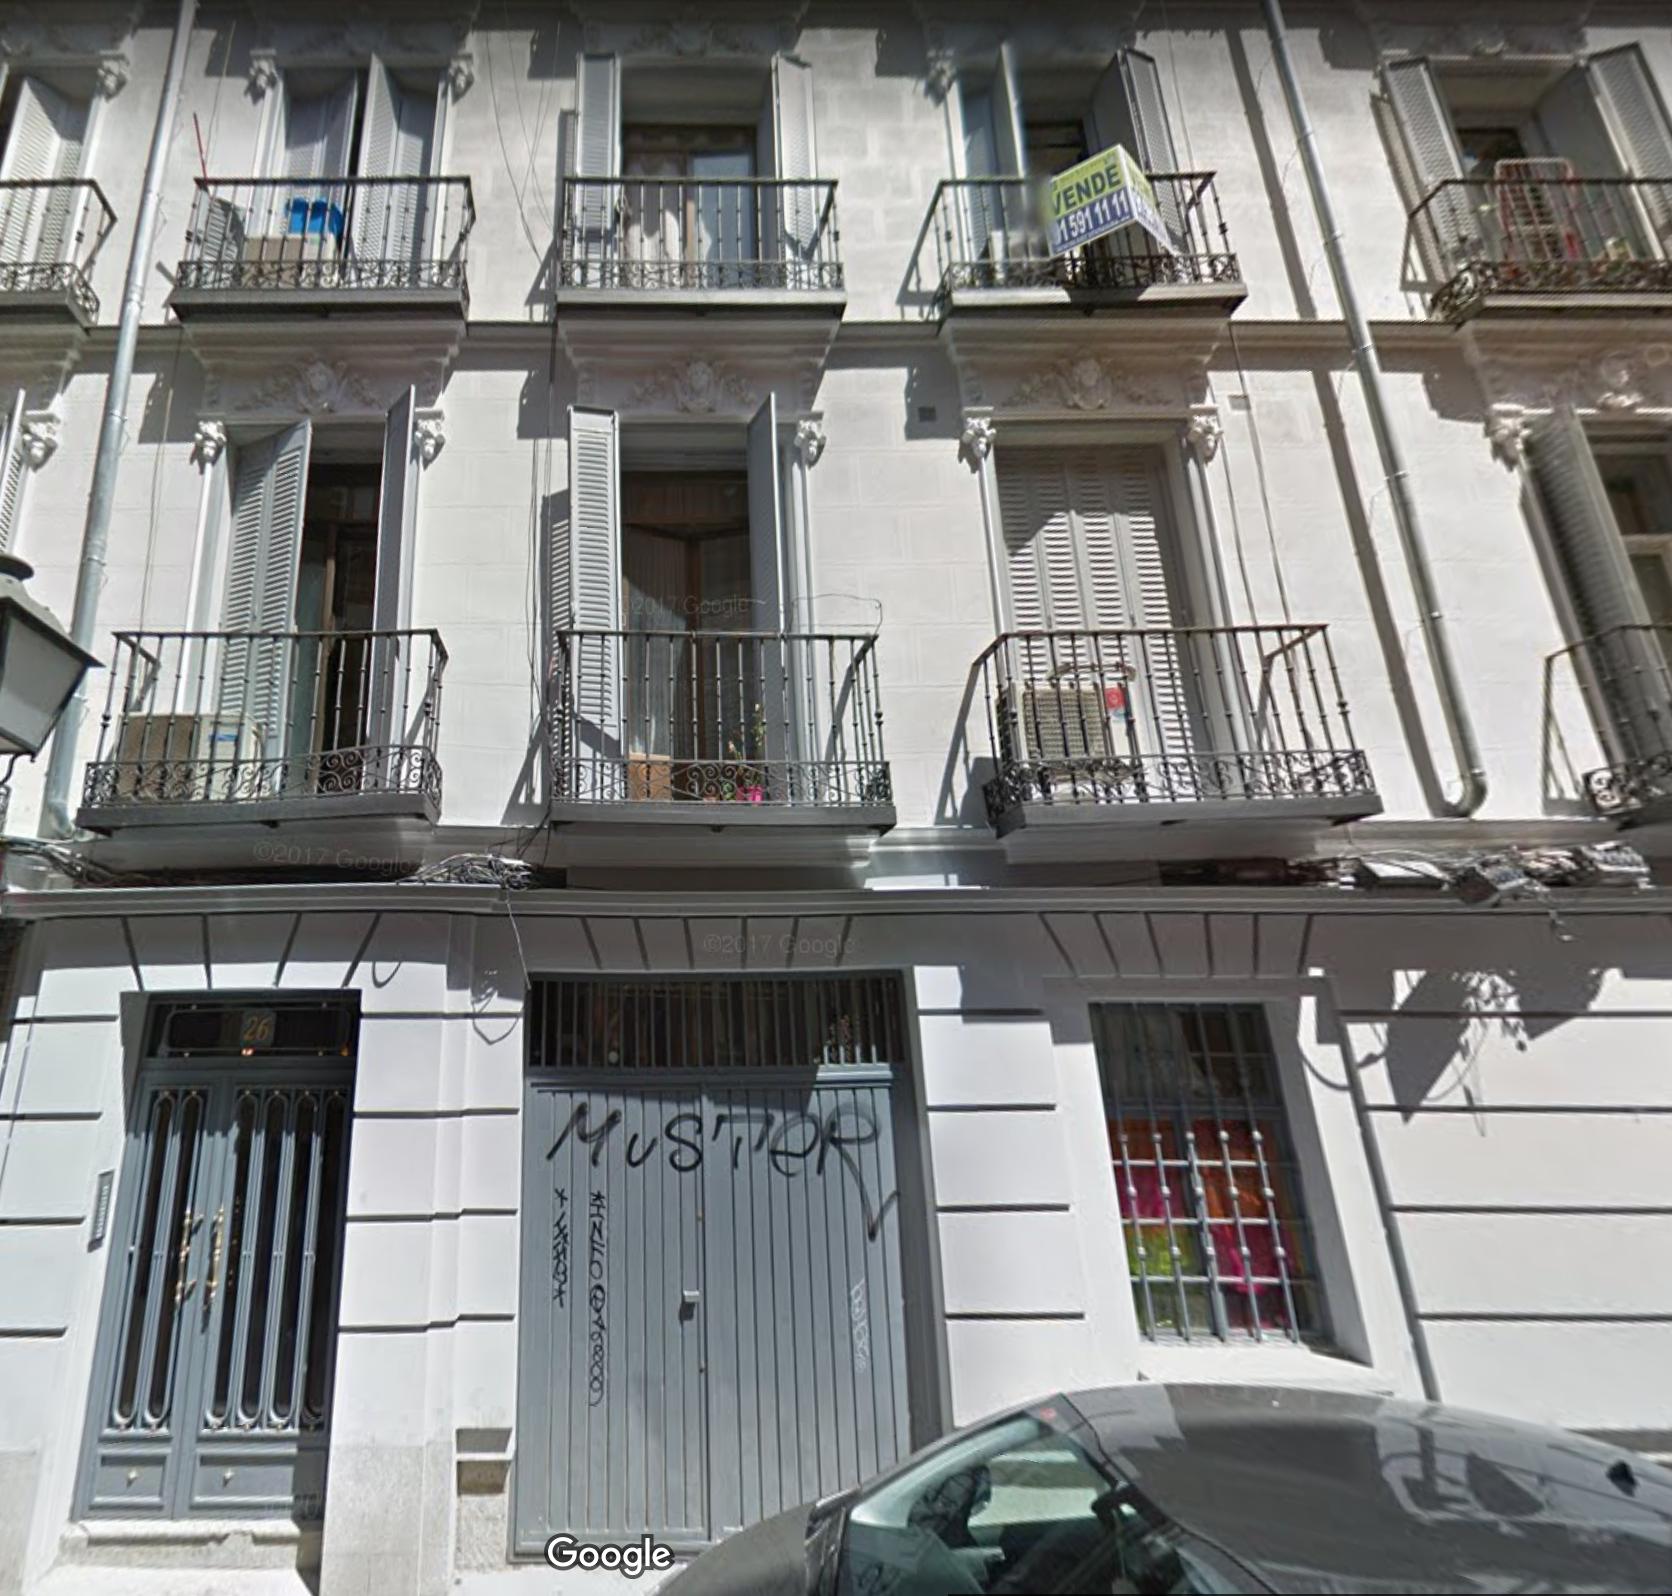 Local en Universidad - Calle Ballesta 26Superficie 157m2Renta esperada 3.100 EUROS/MESPrecio de venta 675.000 EUROS